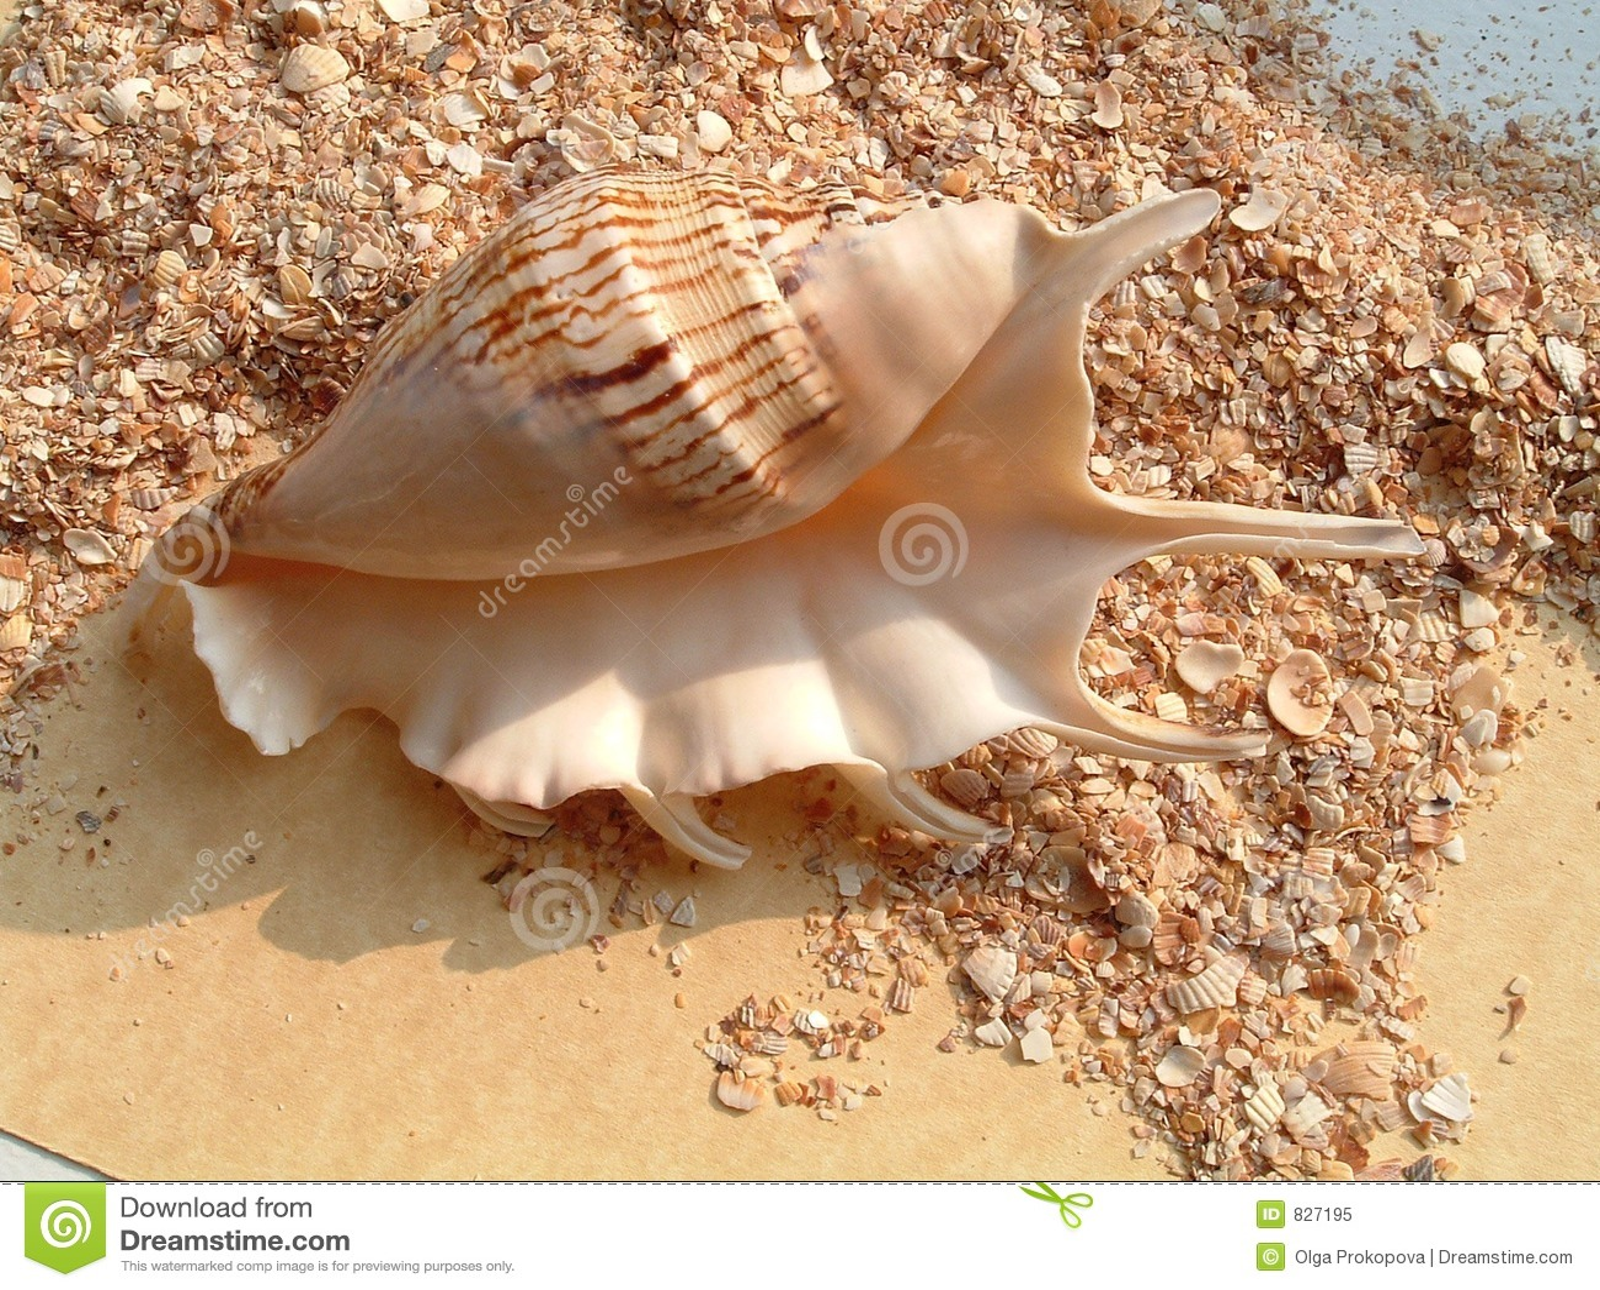 Shell on the stoun